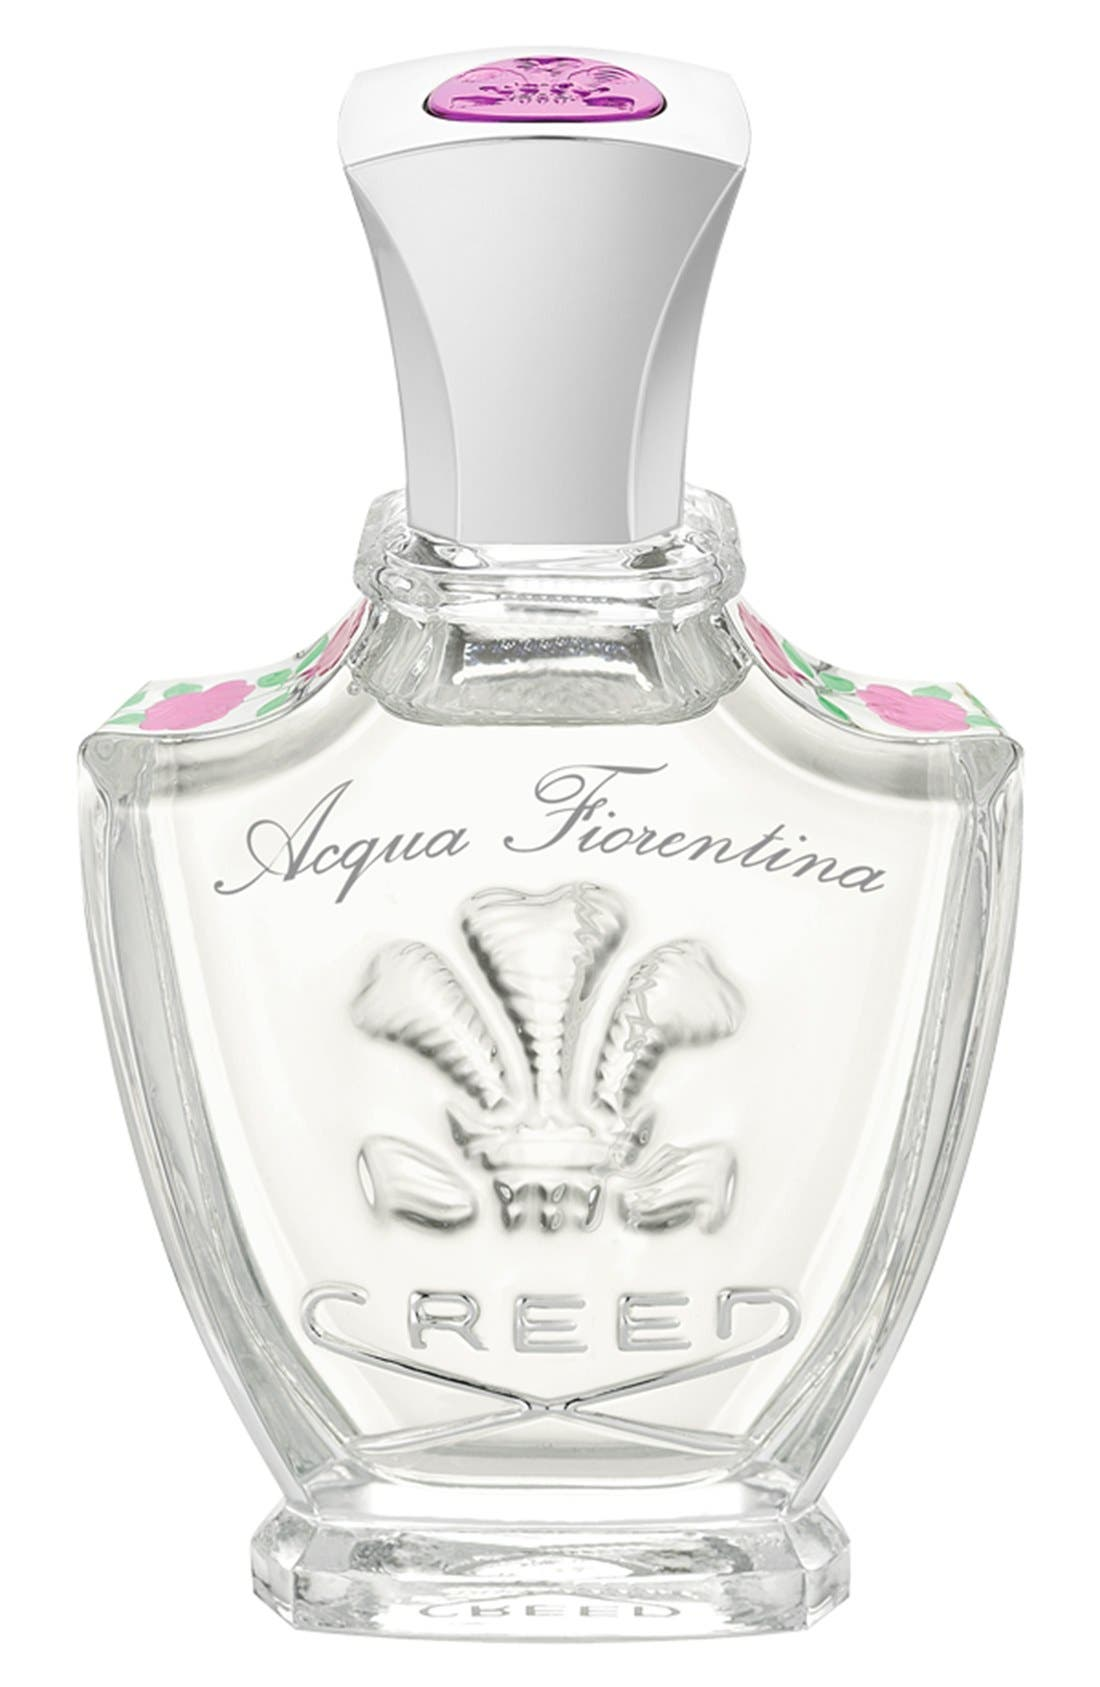 Acqua Fiorentina Fragrance